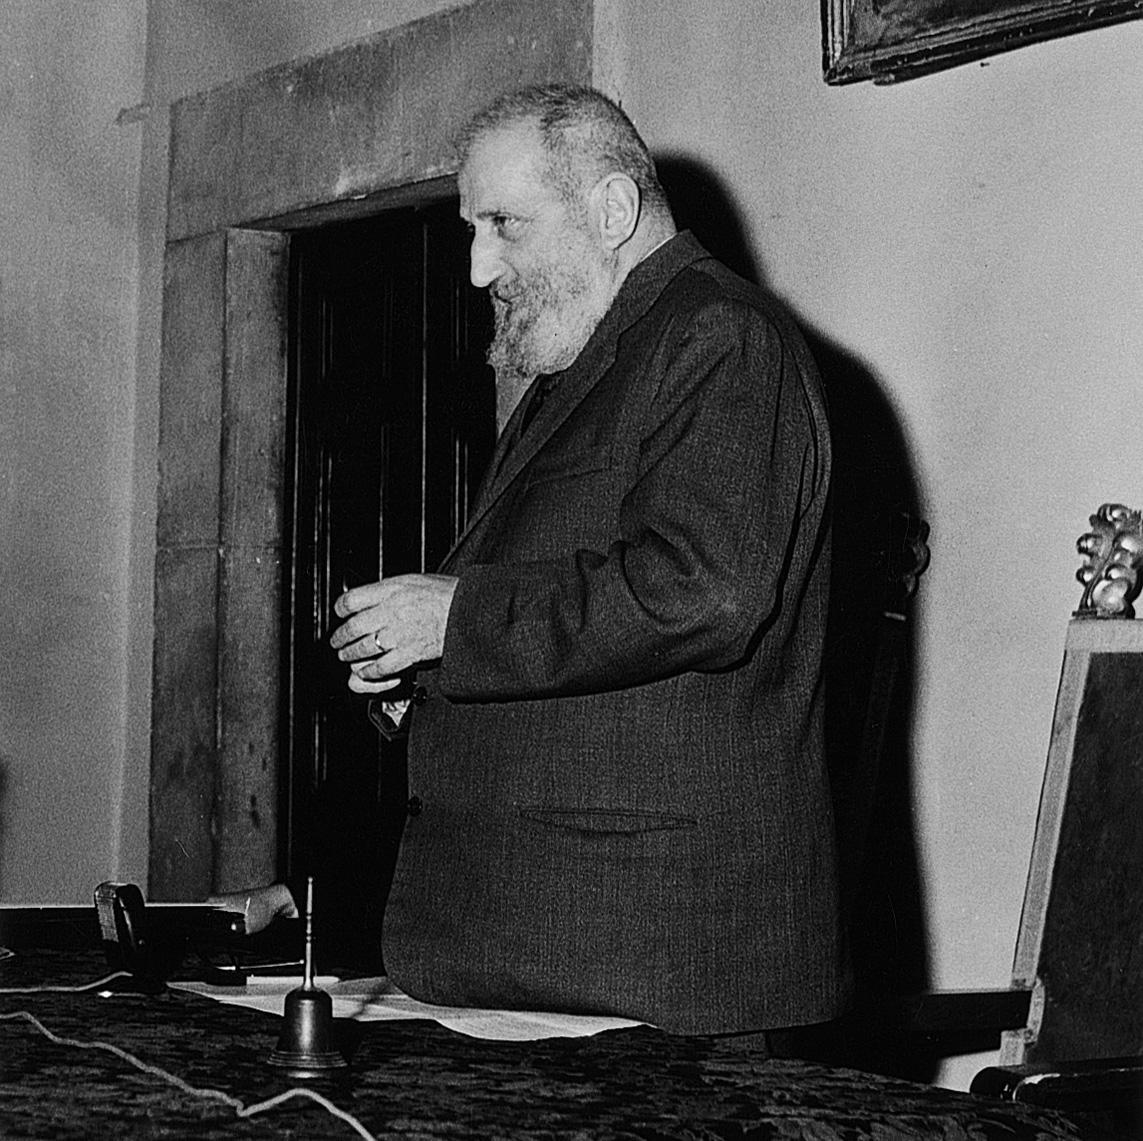 Giovan Battista Picotti (1878-1970)